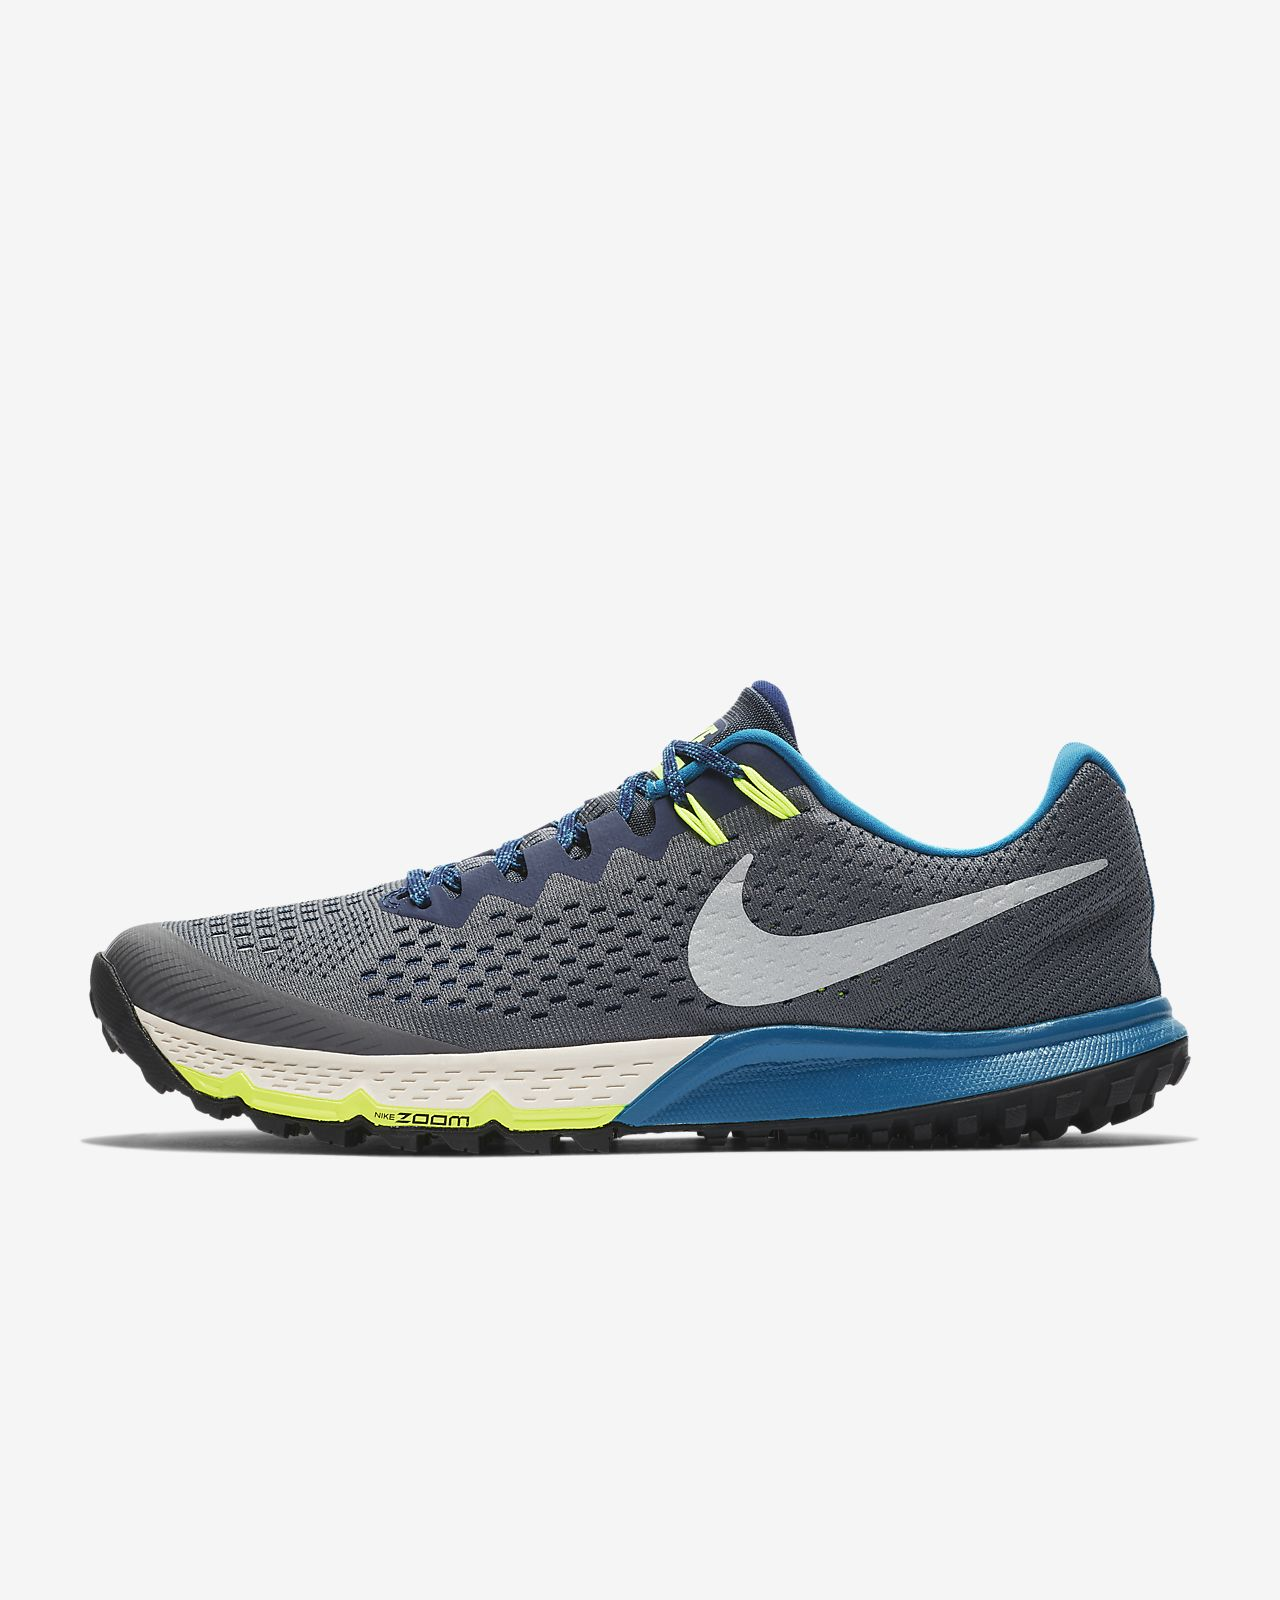 huge discount 2e2f6 df266 ... Calzado de running para hombre Nike Air Zoom Terra Kiger 4